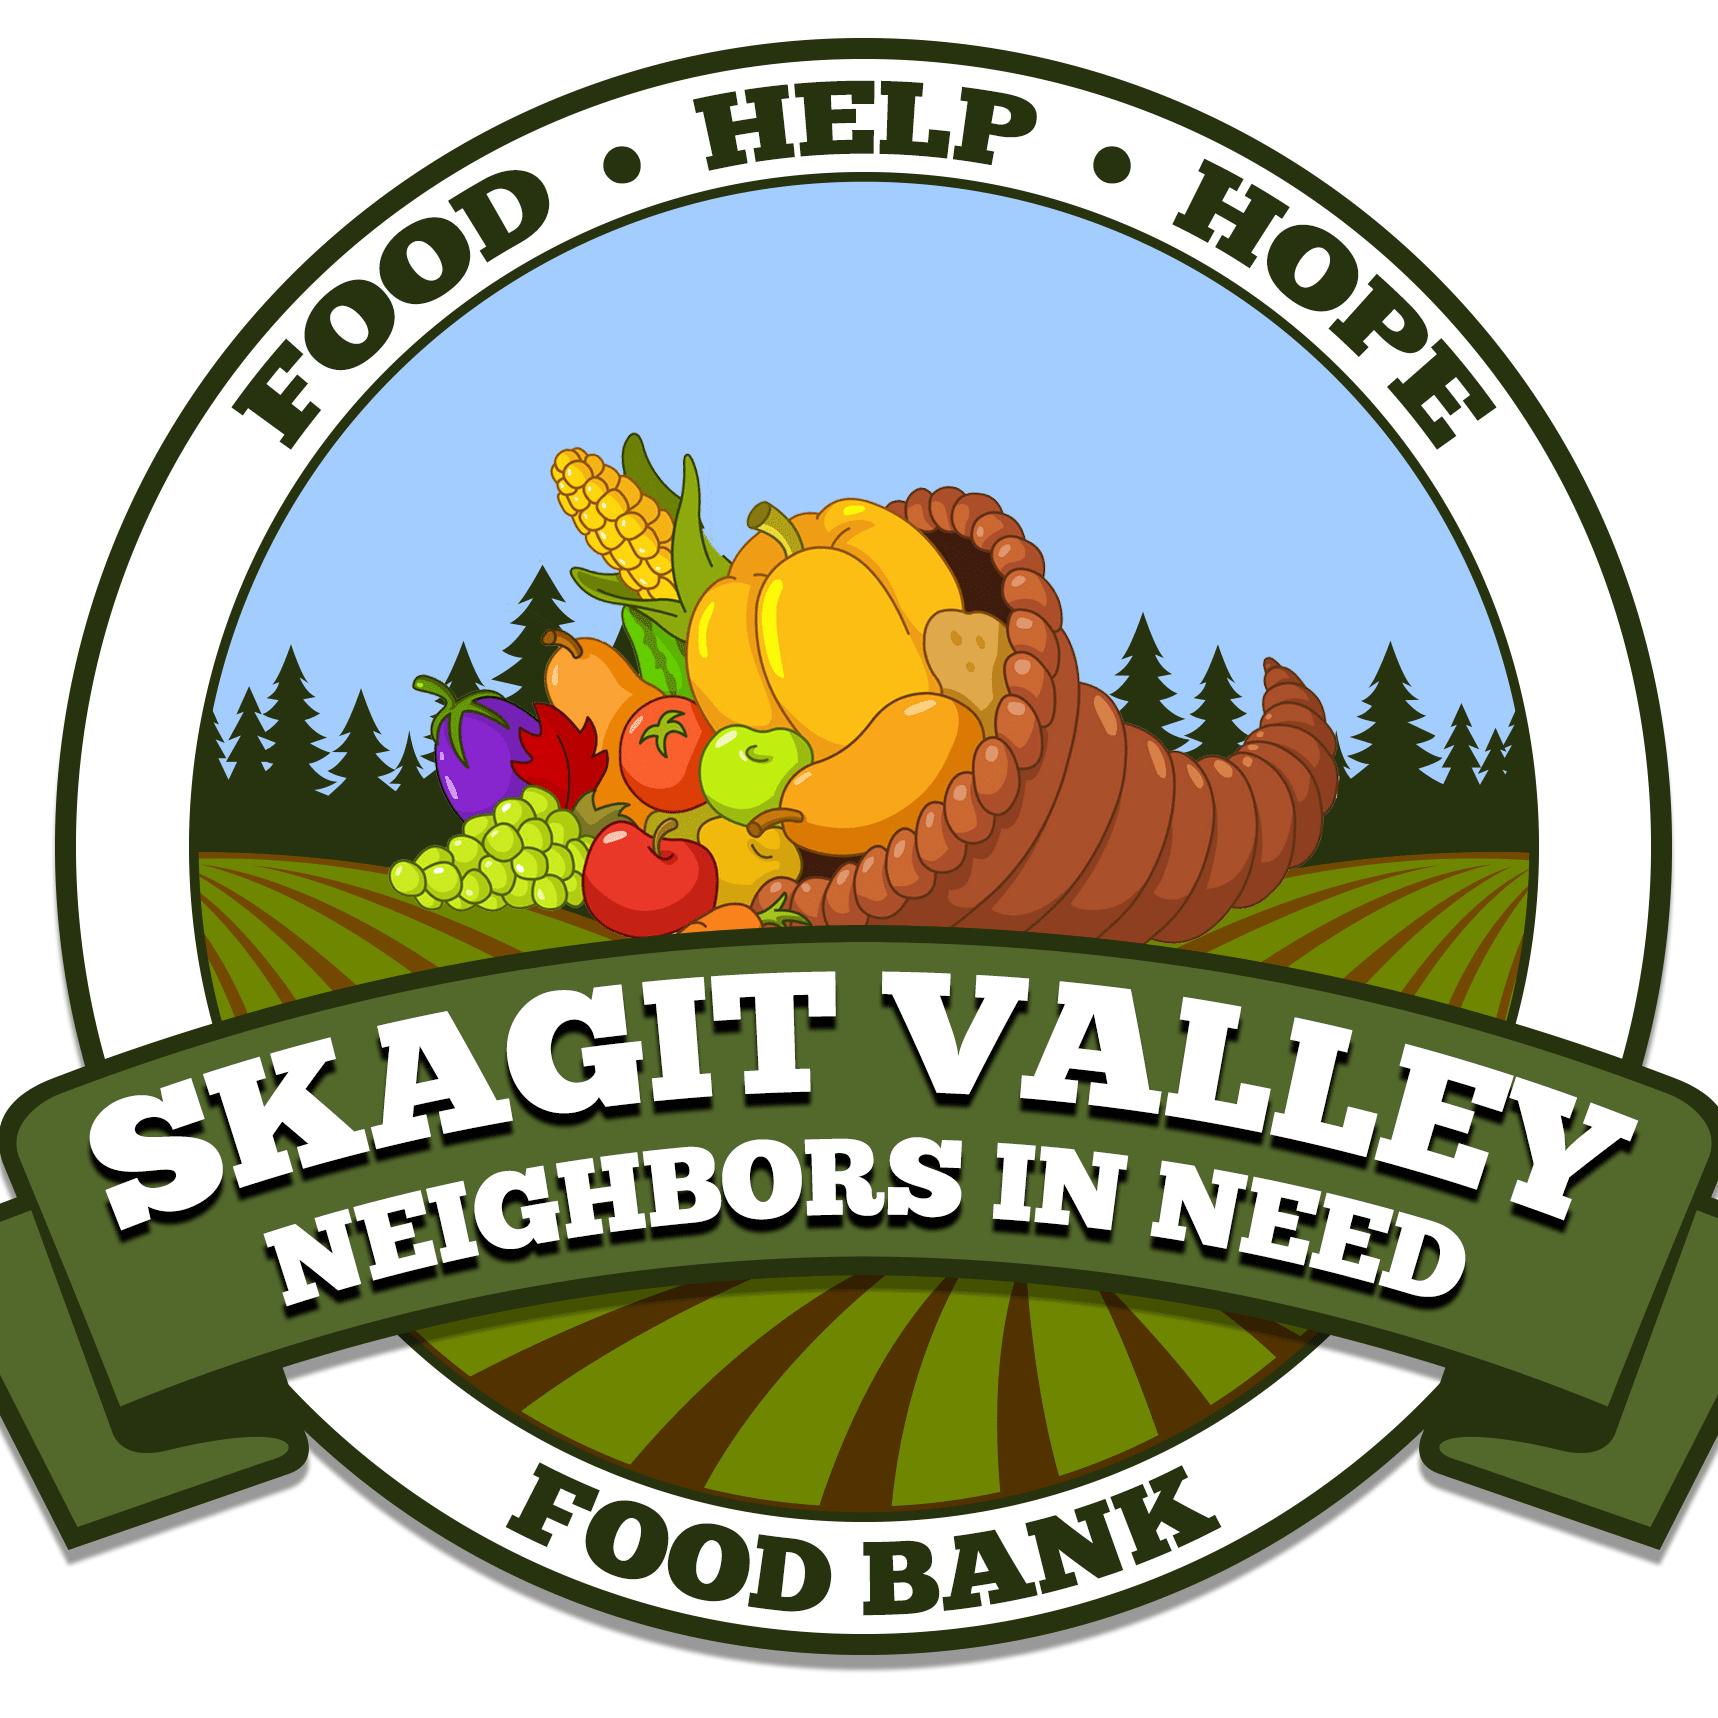 Skagit Valley Neighbors In Need